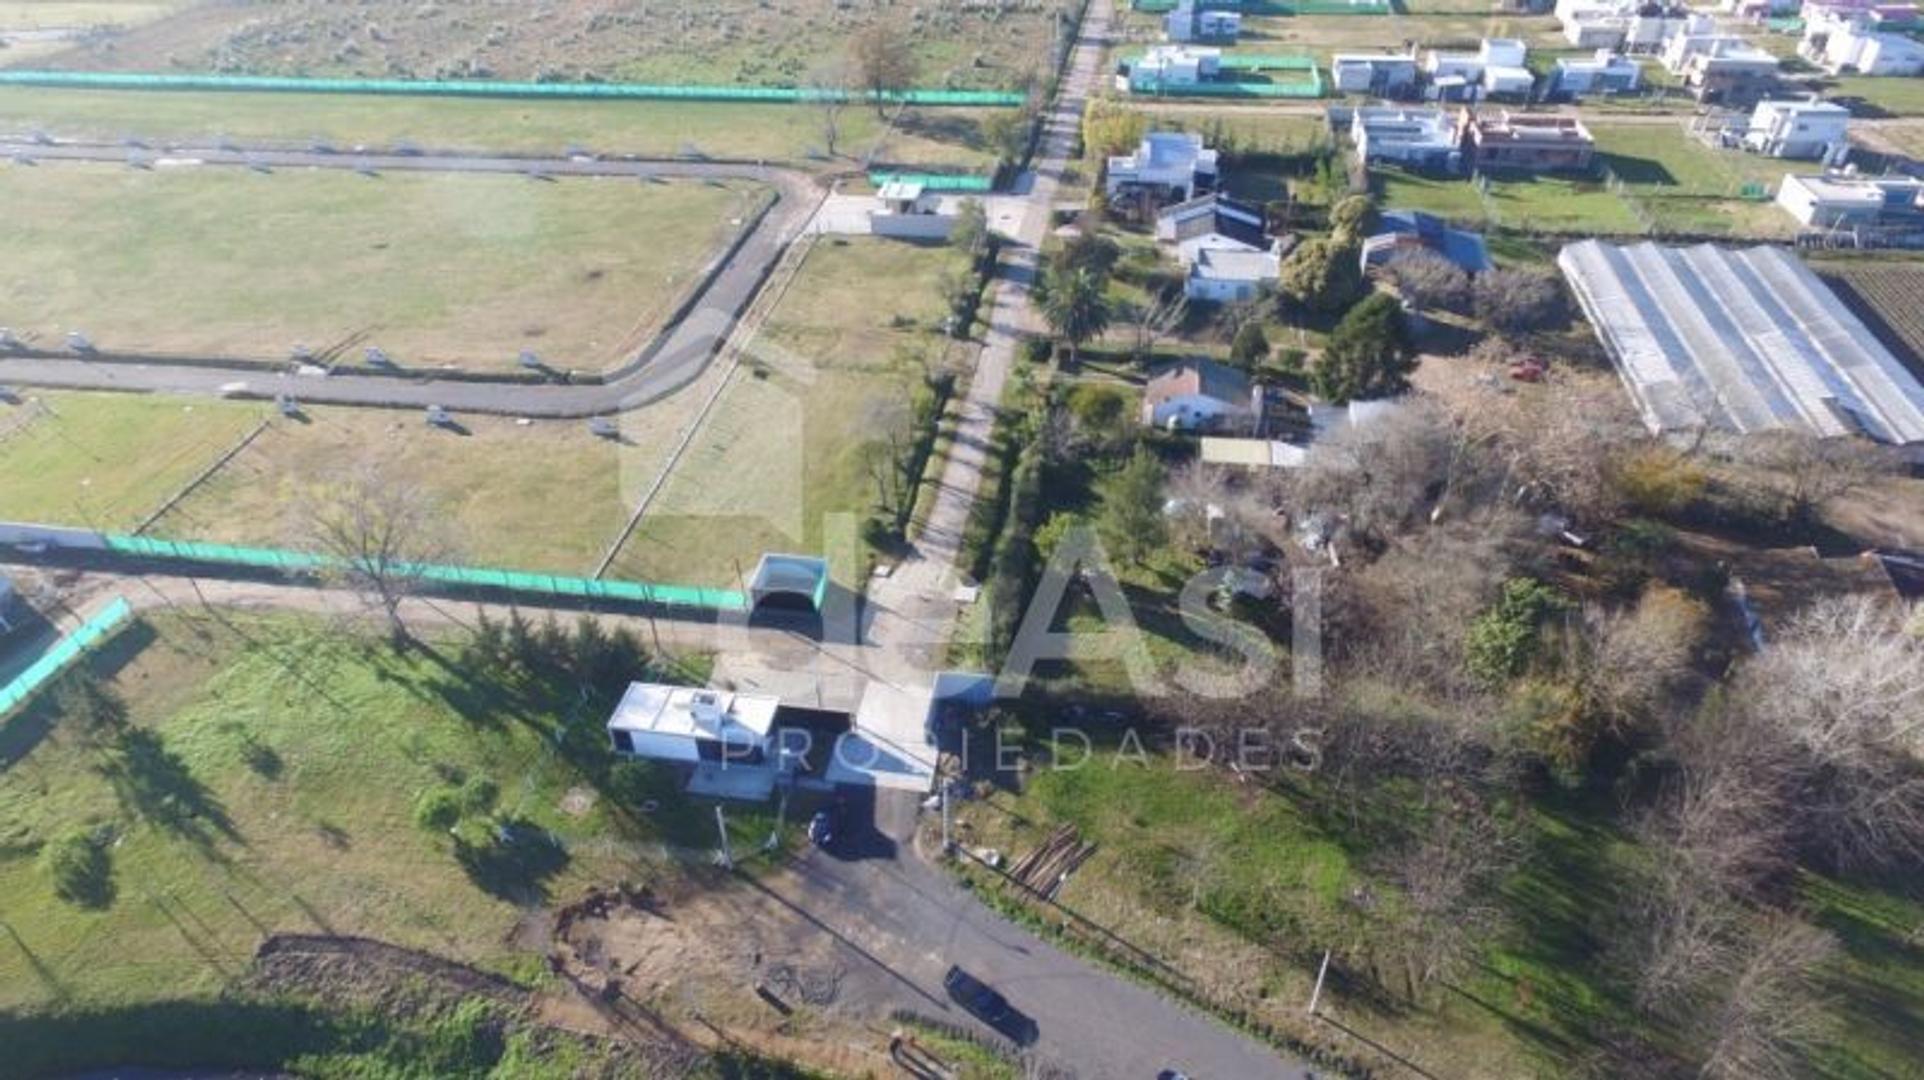 XINTEL(MDA-MDA-728) Lote - Venta - Argentina, La Plata